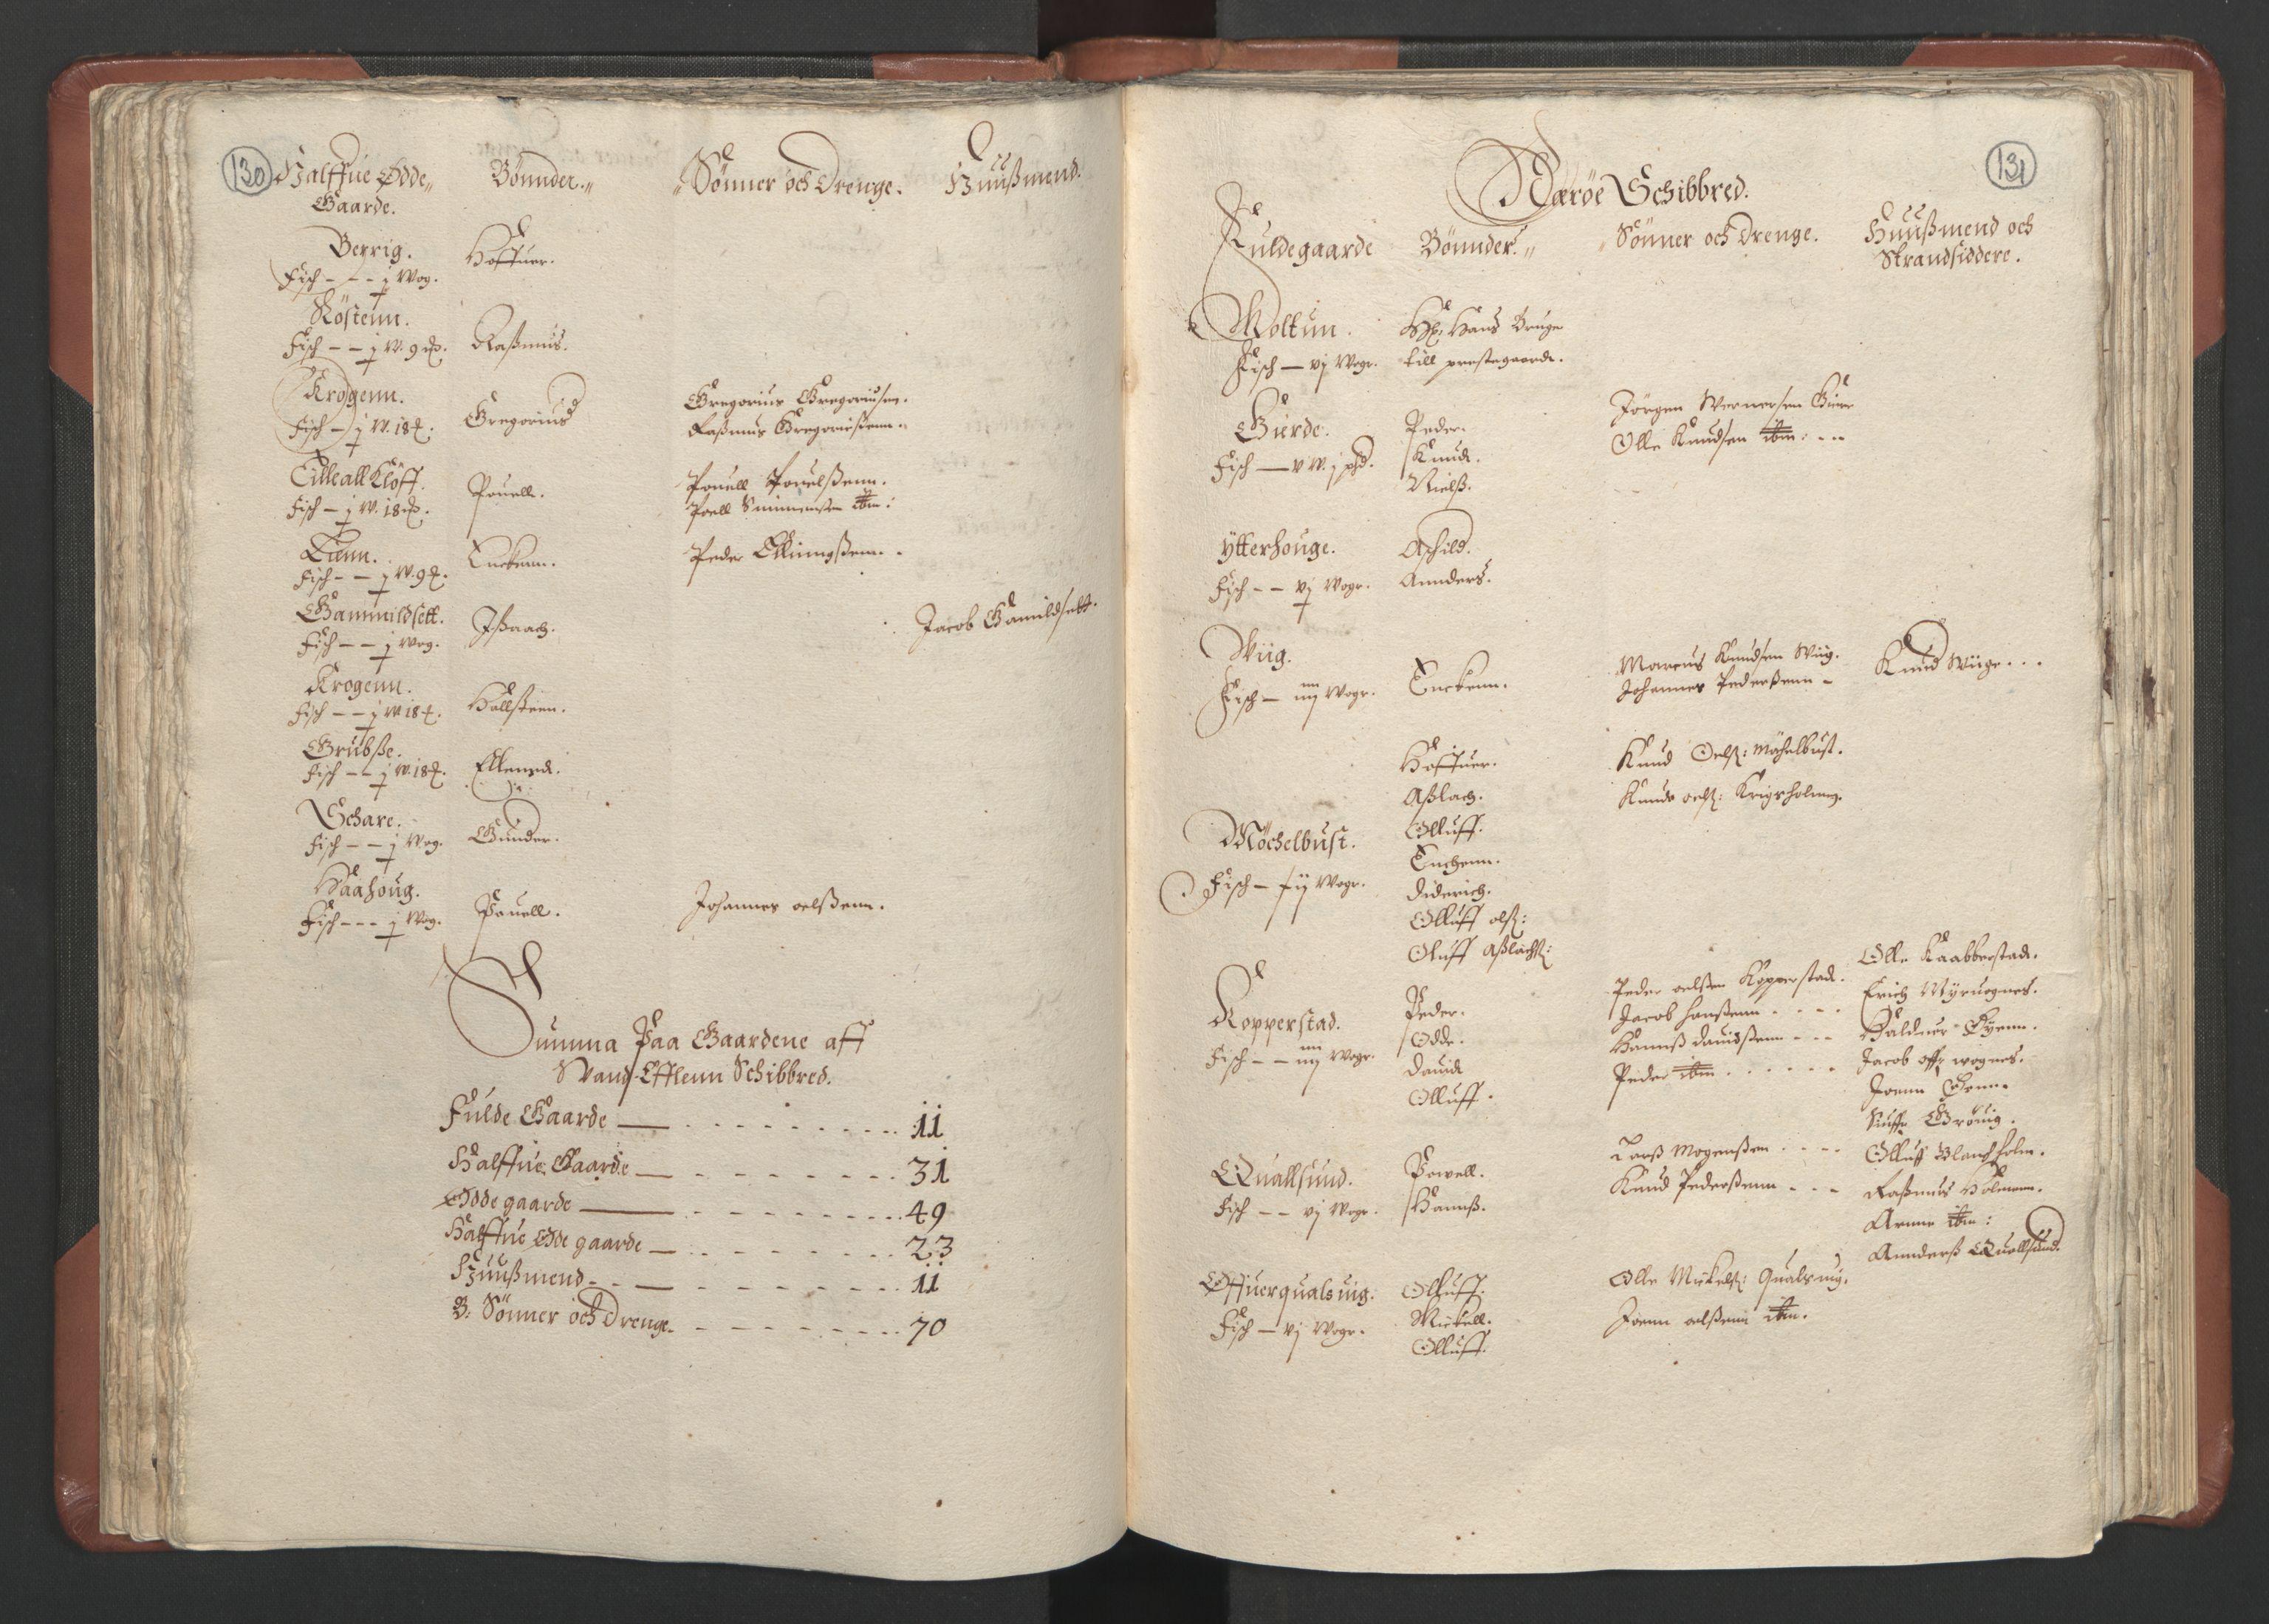 RA, Fogdenes og sorenskrivernes manntall 1664-1666, nr. 16: Romsdal fogderi og Sunnmøre fogderi, 1664-1665, s. 130-131